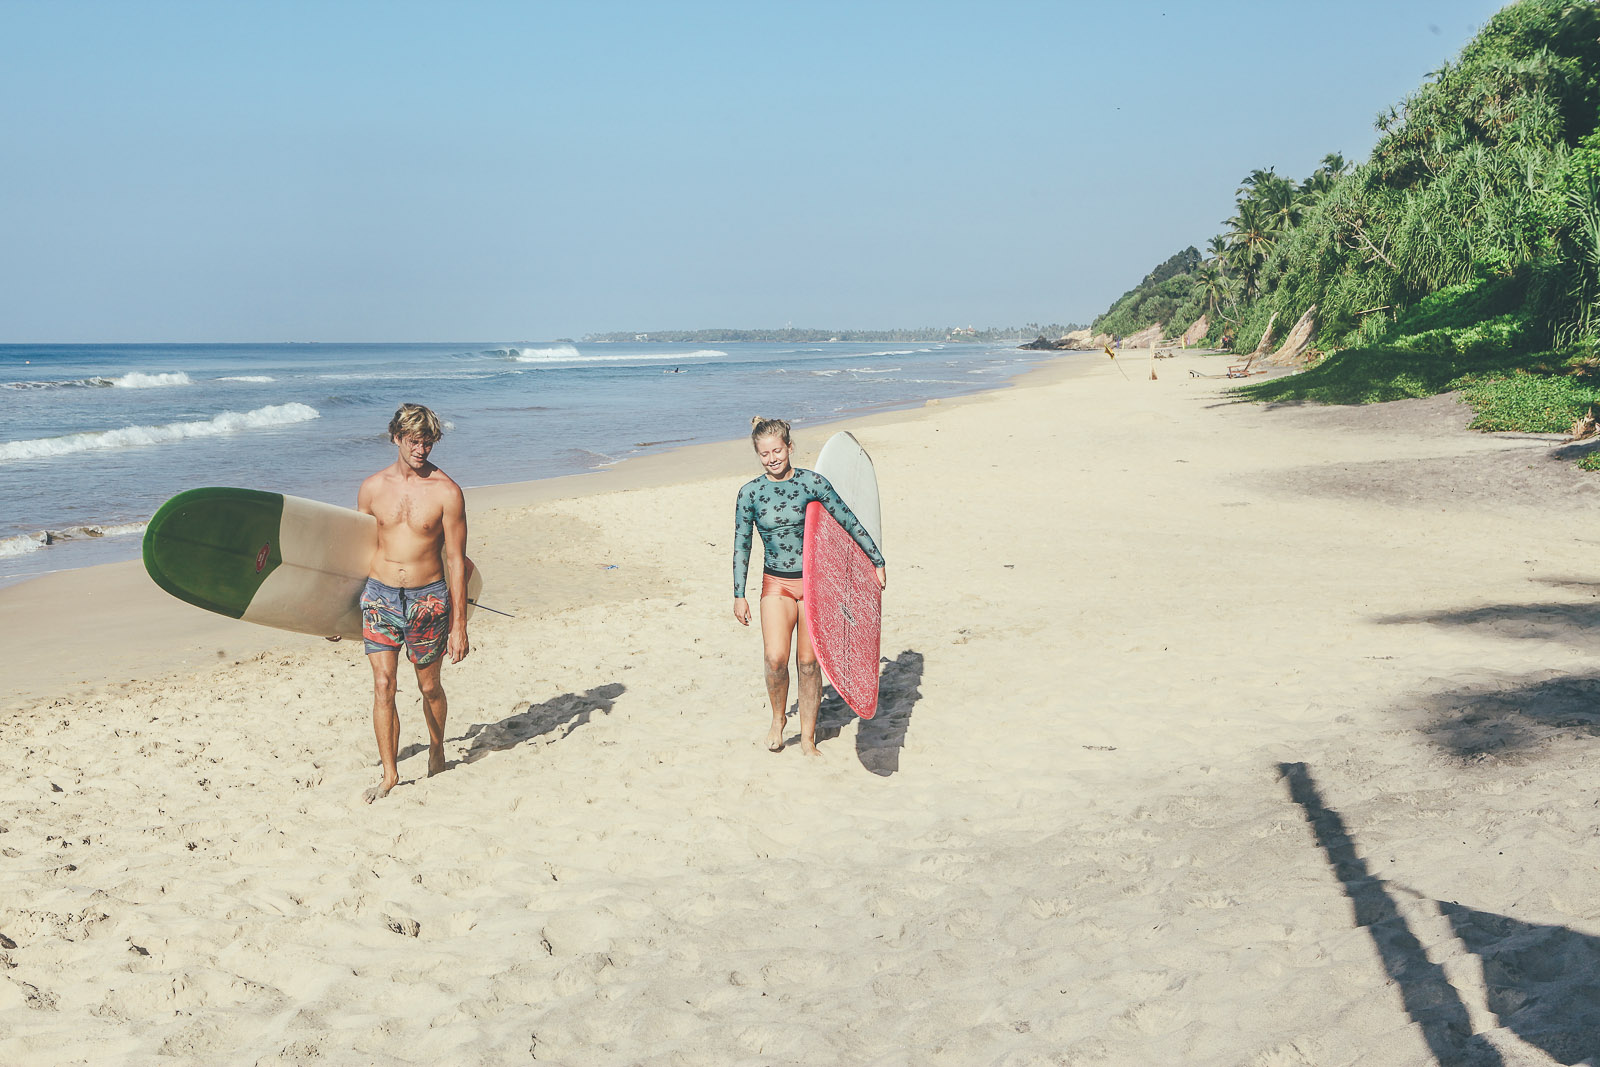 Sunshinestories-Sri-Lanka-Medawatta-Medawata-Meda-Watta-Mada-surf-Lonboard-Surfing-Wave-Surf-School-Camp-Yoga-Studio-IMG_0829